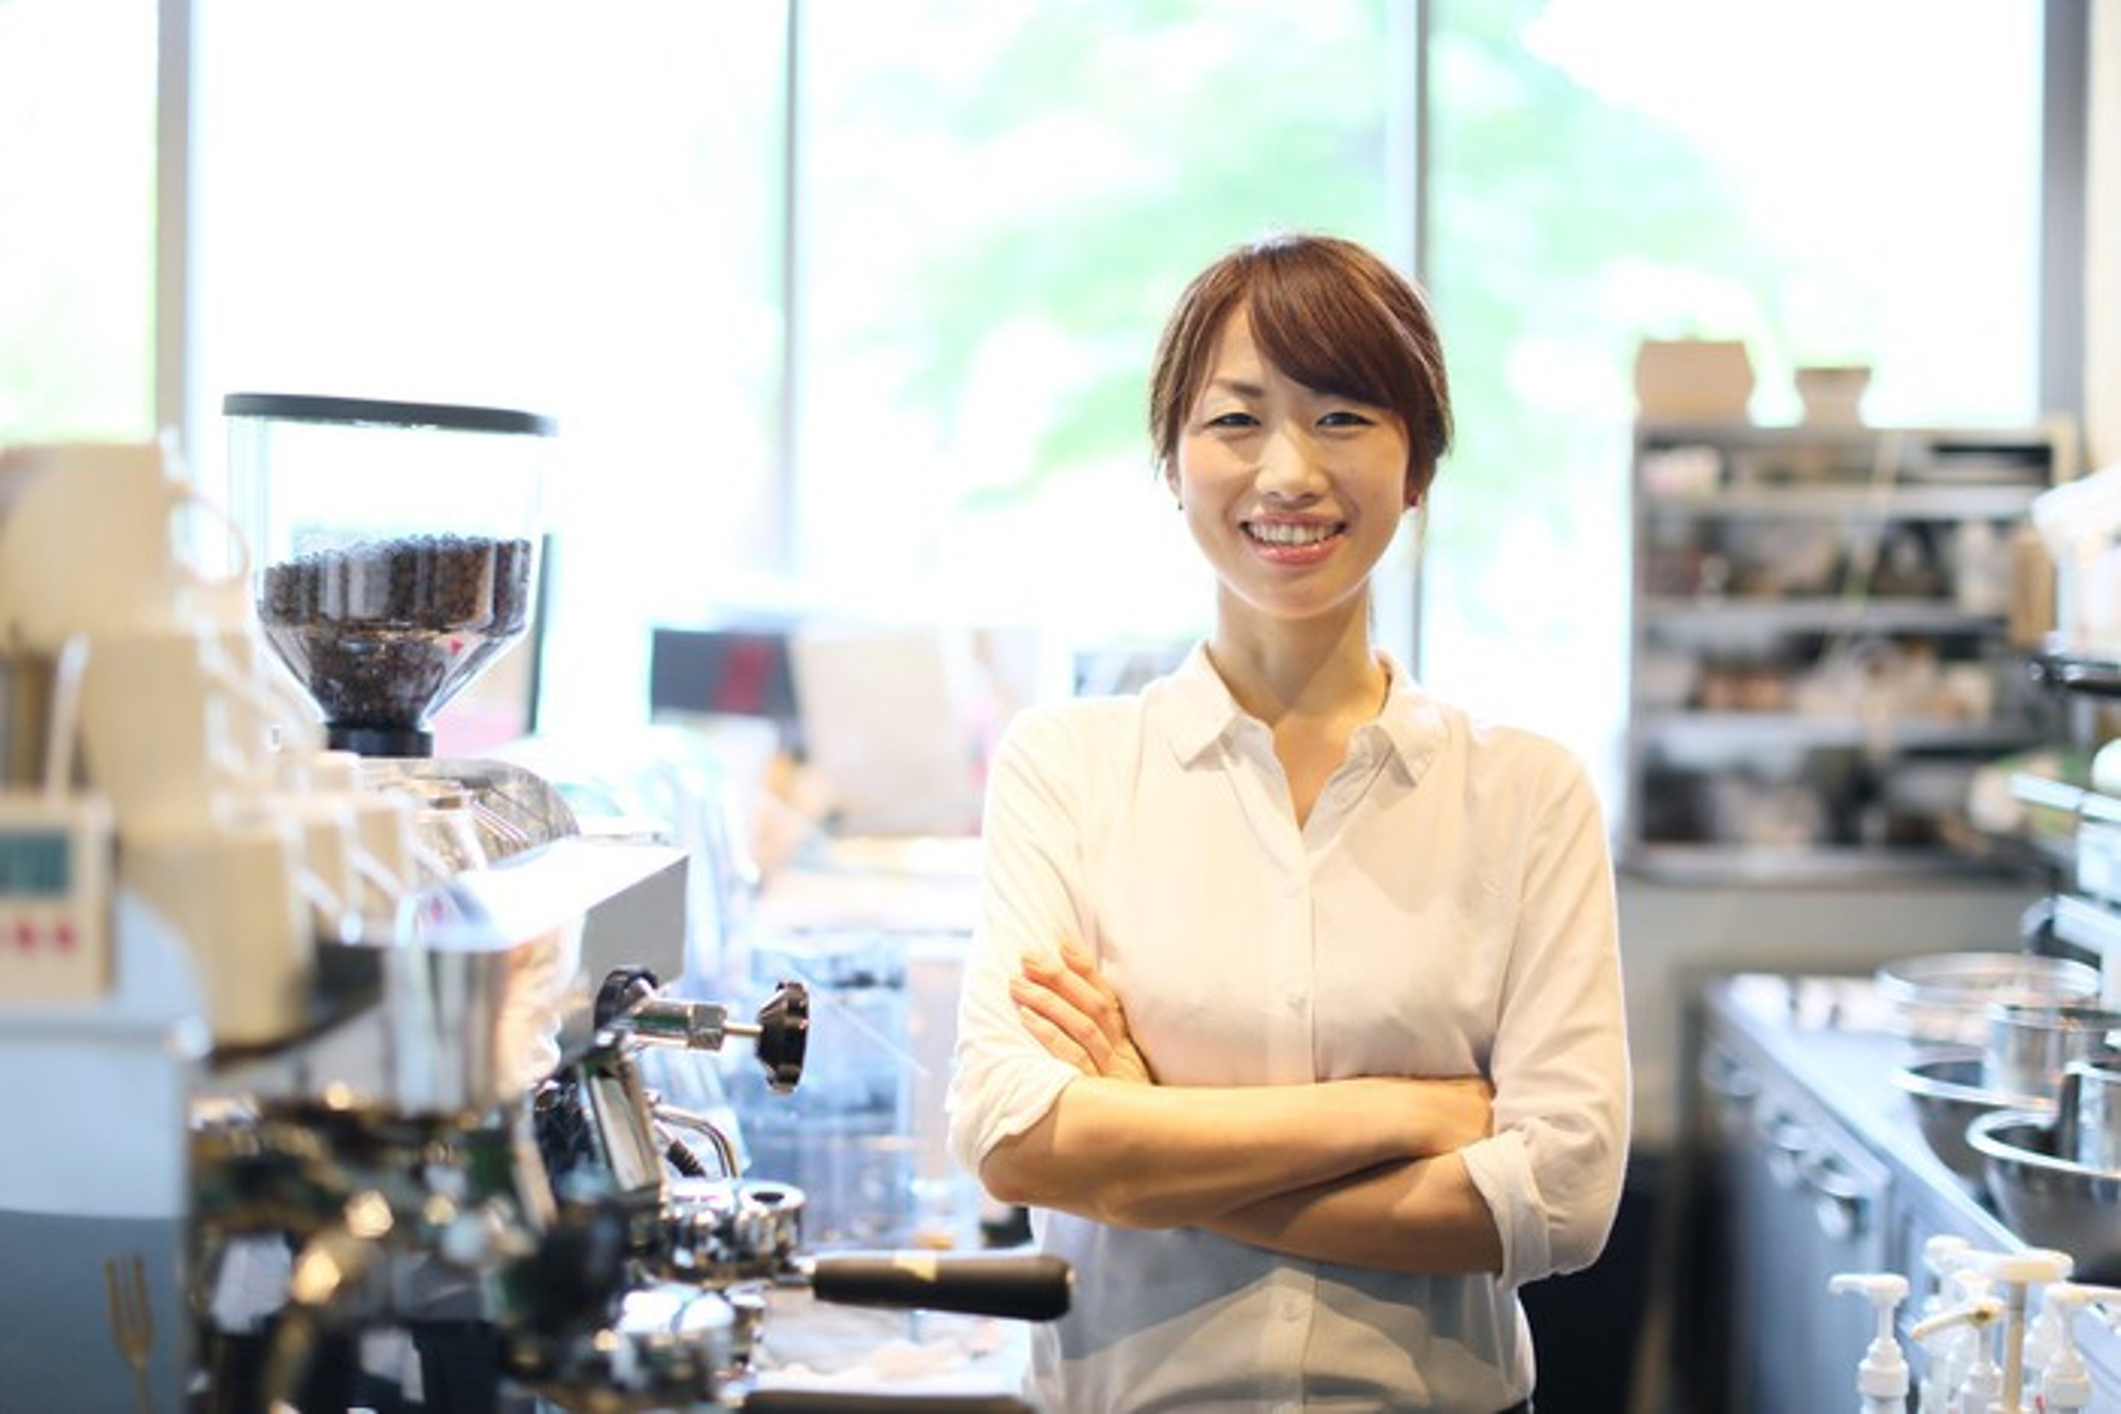 A female entrepreneur stands near the espresso machine in her coffee shop.